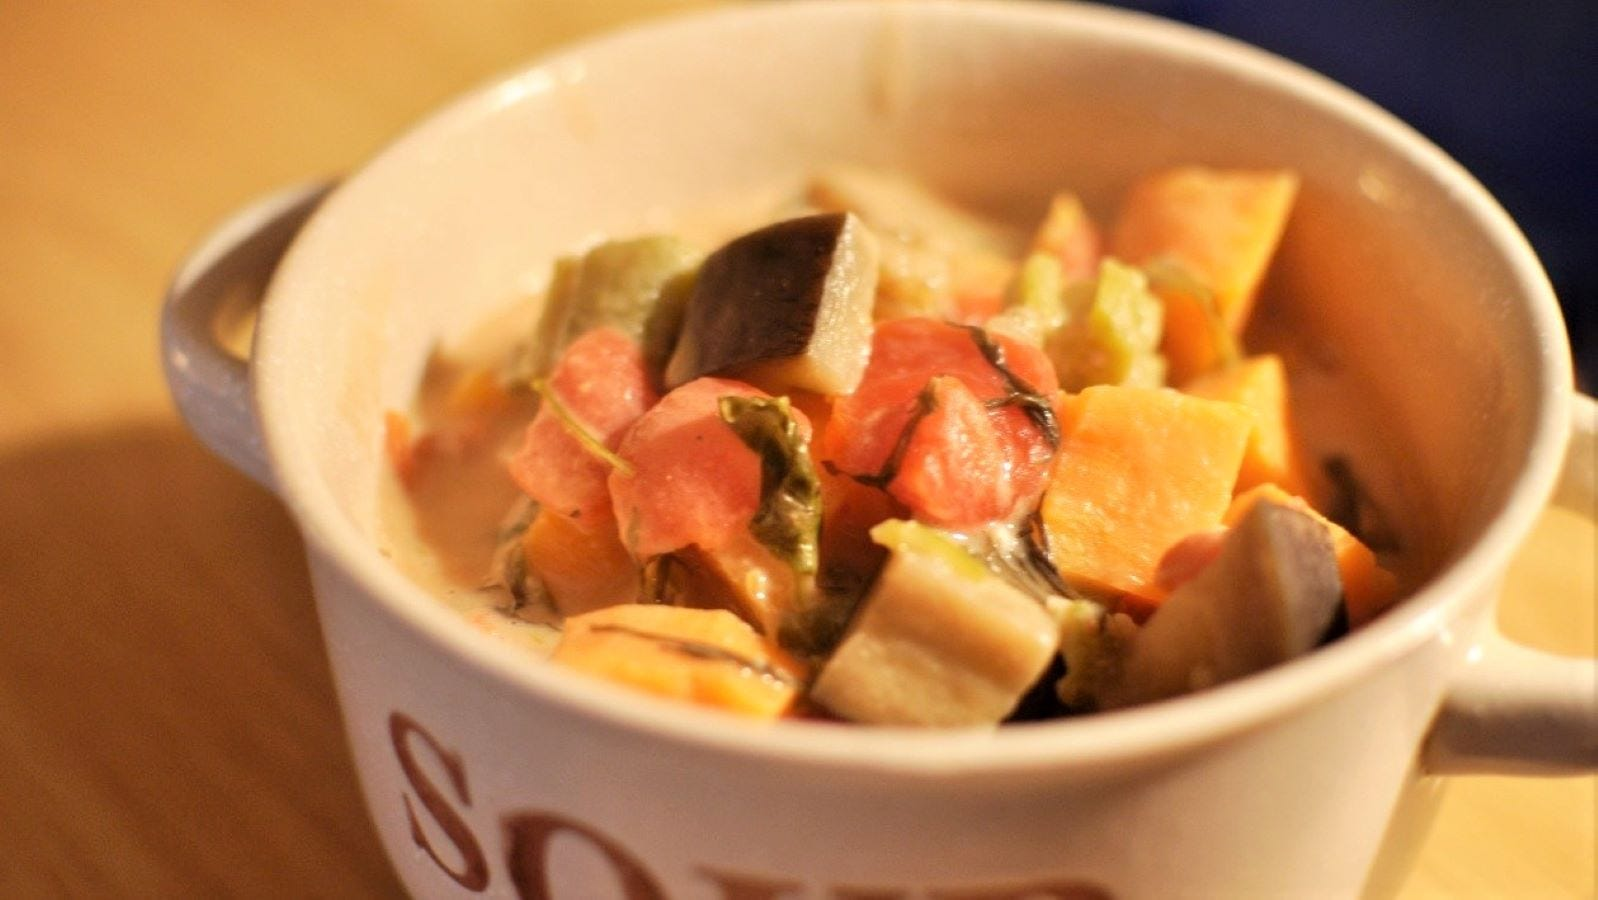 A soup bowl full of daraba.